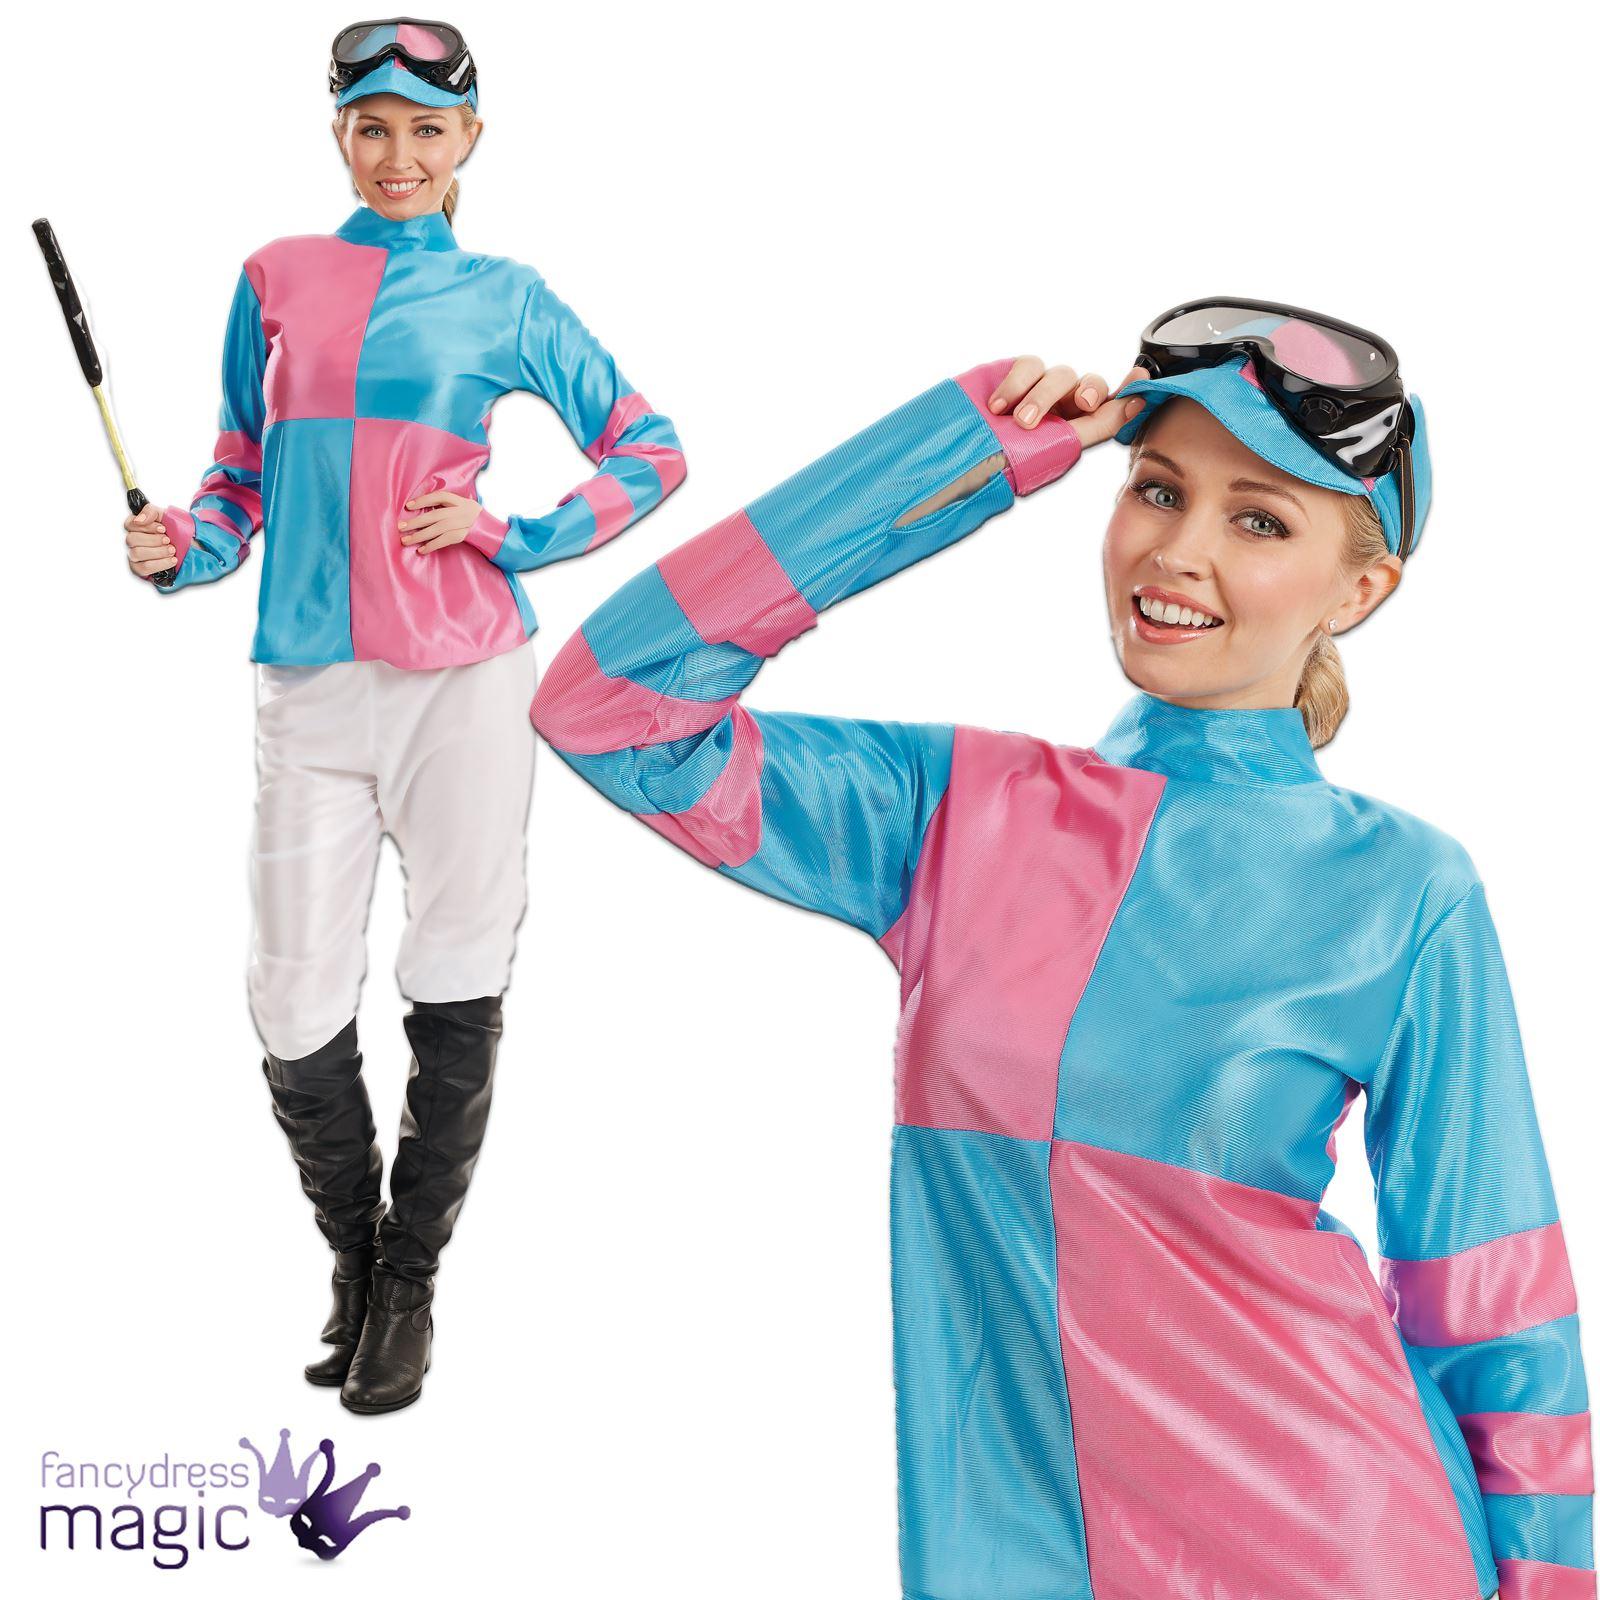 Female-Jockey-Womens-Pink-Blue-Sports-Horse-Rider-  sc 1 st  eBay & Female Jockey Womens Pink Blue Sports Horse Rider Fancy Dress ...